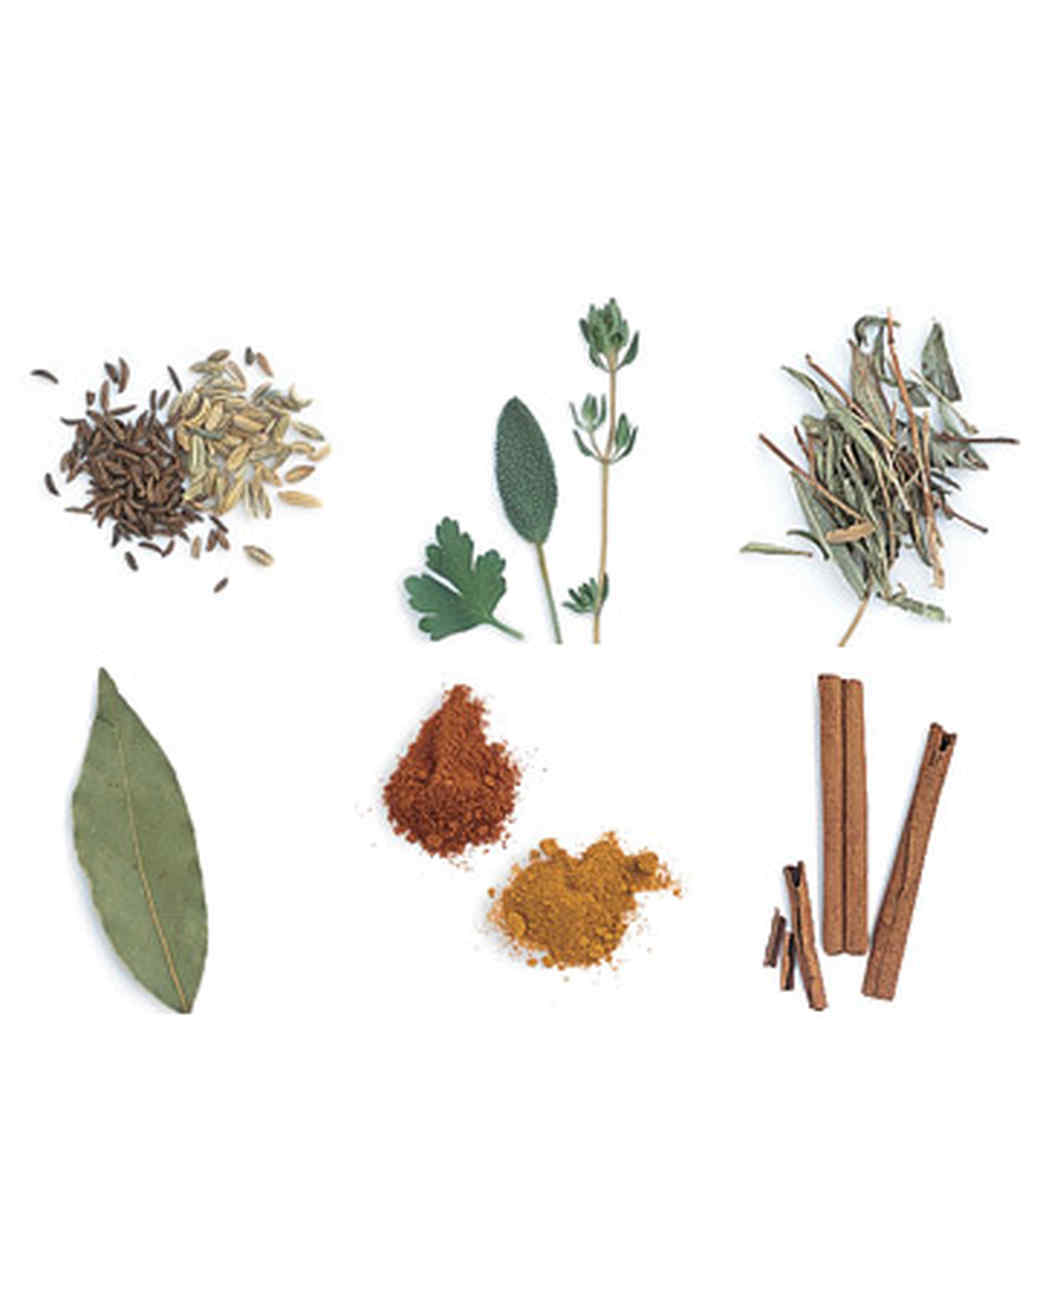 msl_1102_herbs_spices.jpg